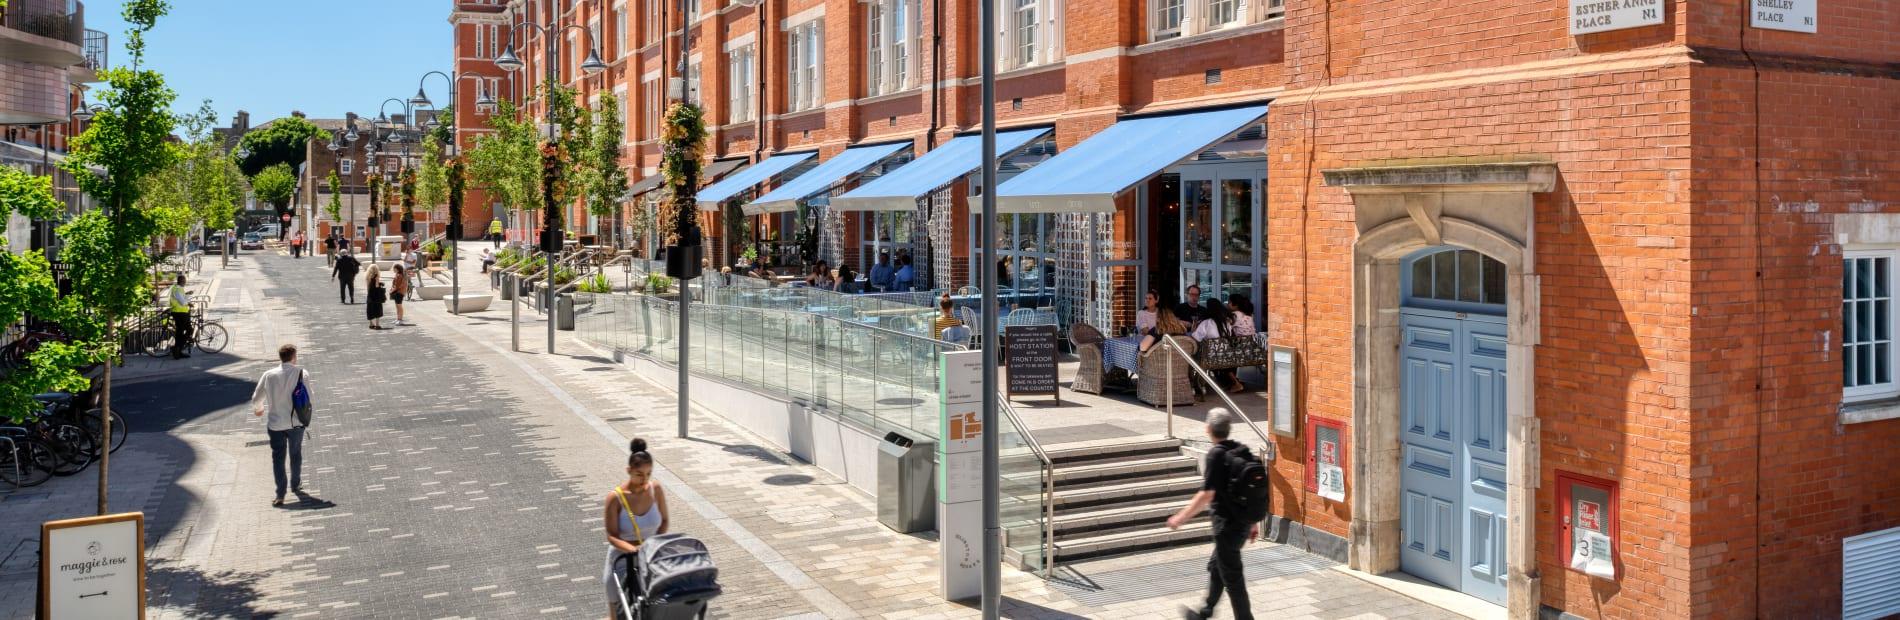 Modal paving laid in Islington Square